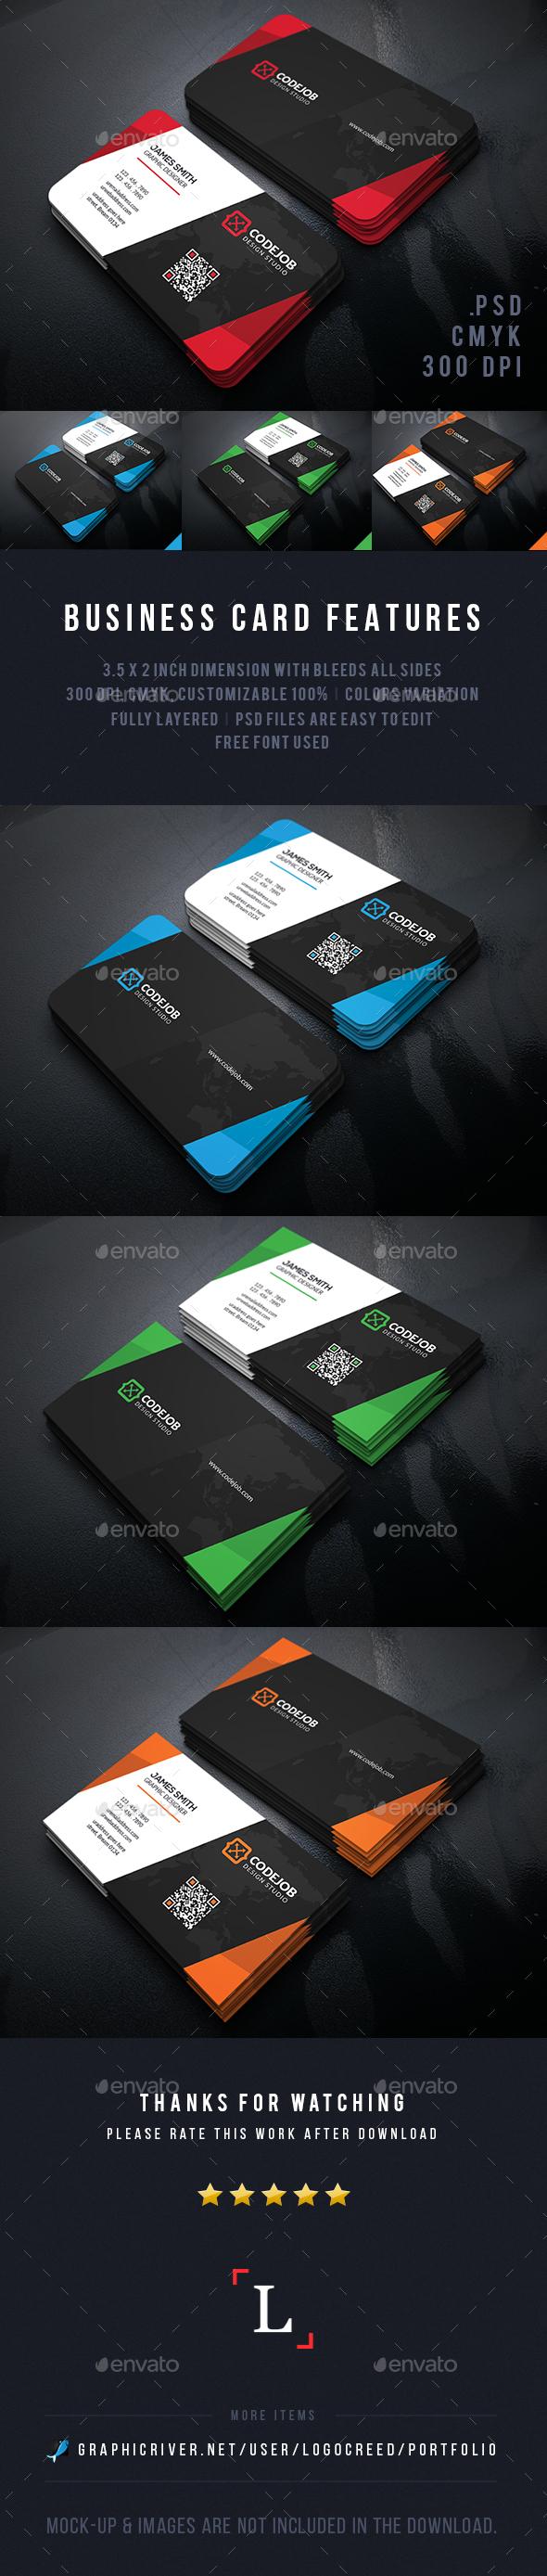 Design Business Cards - Business Cards Print Templates